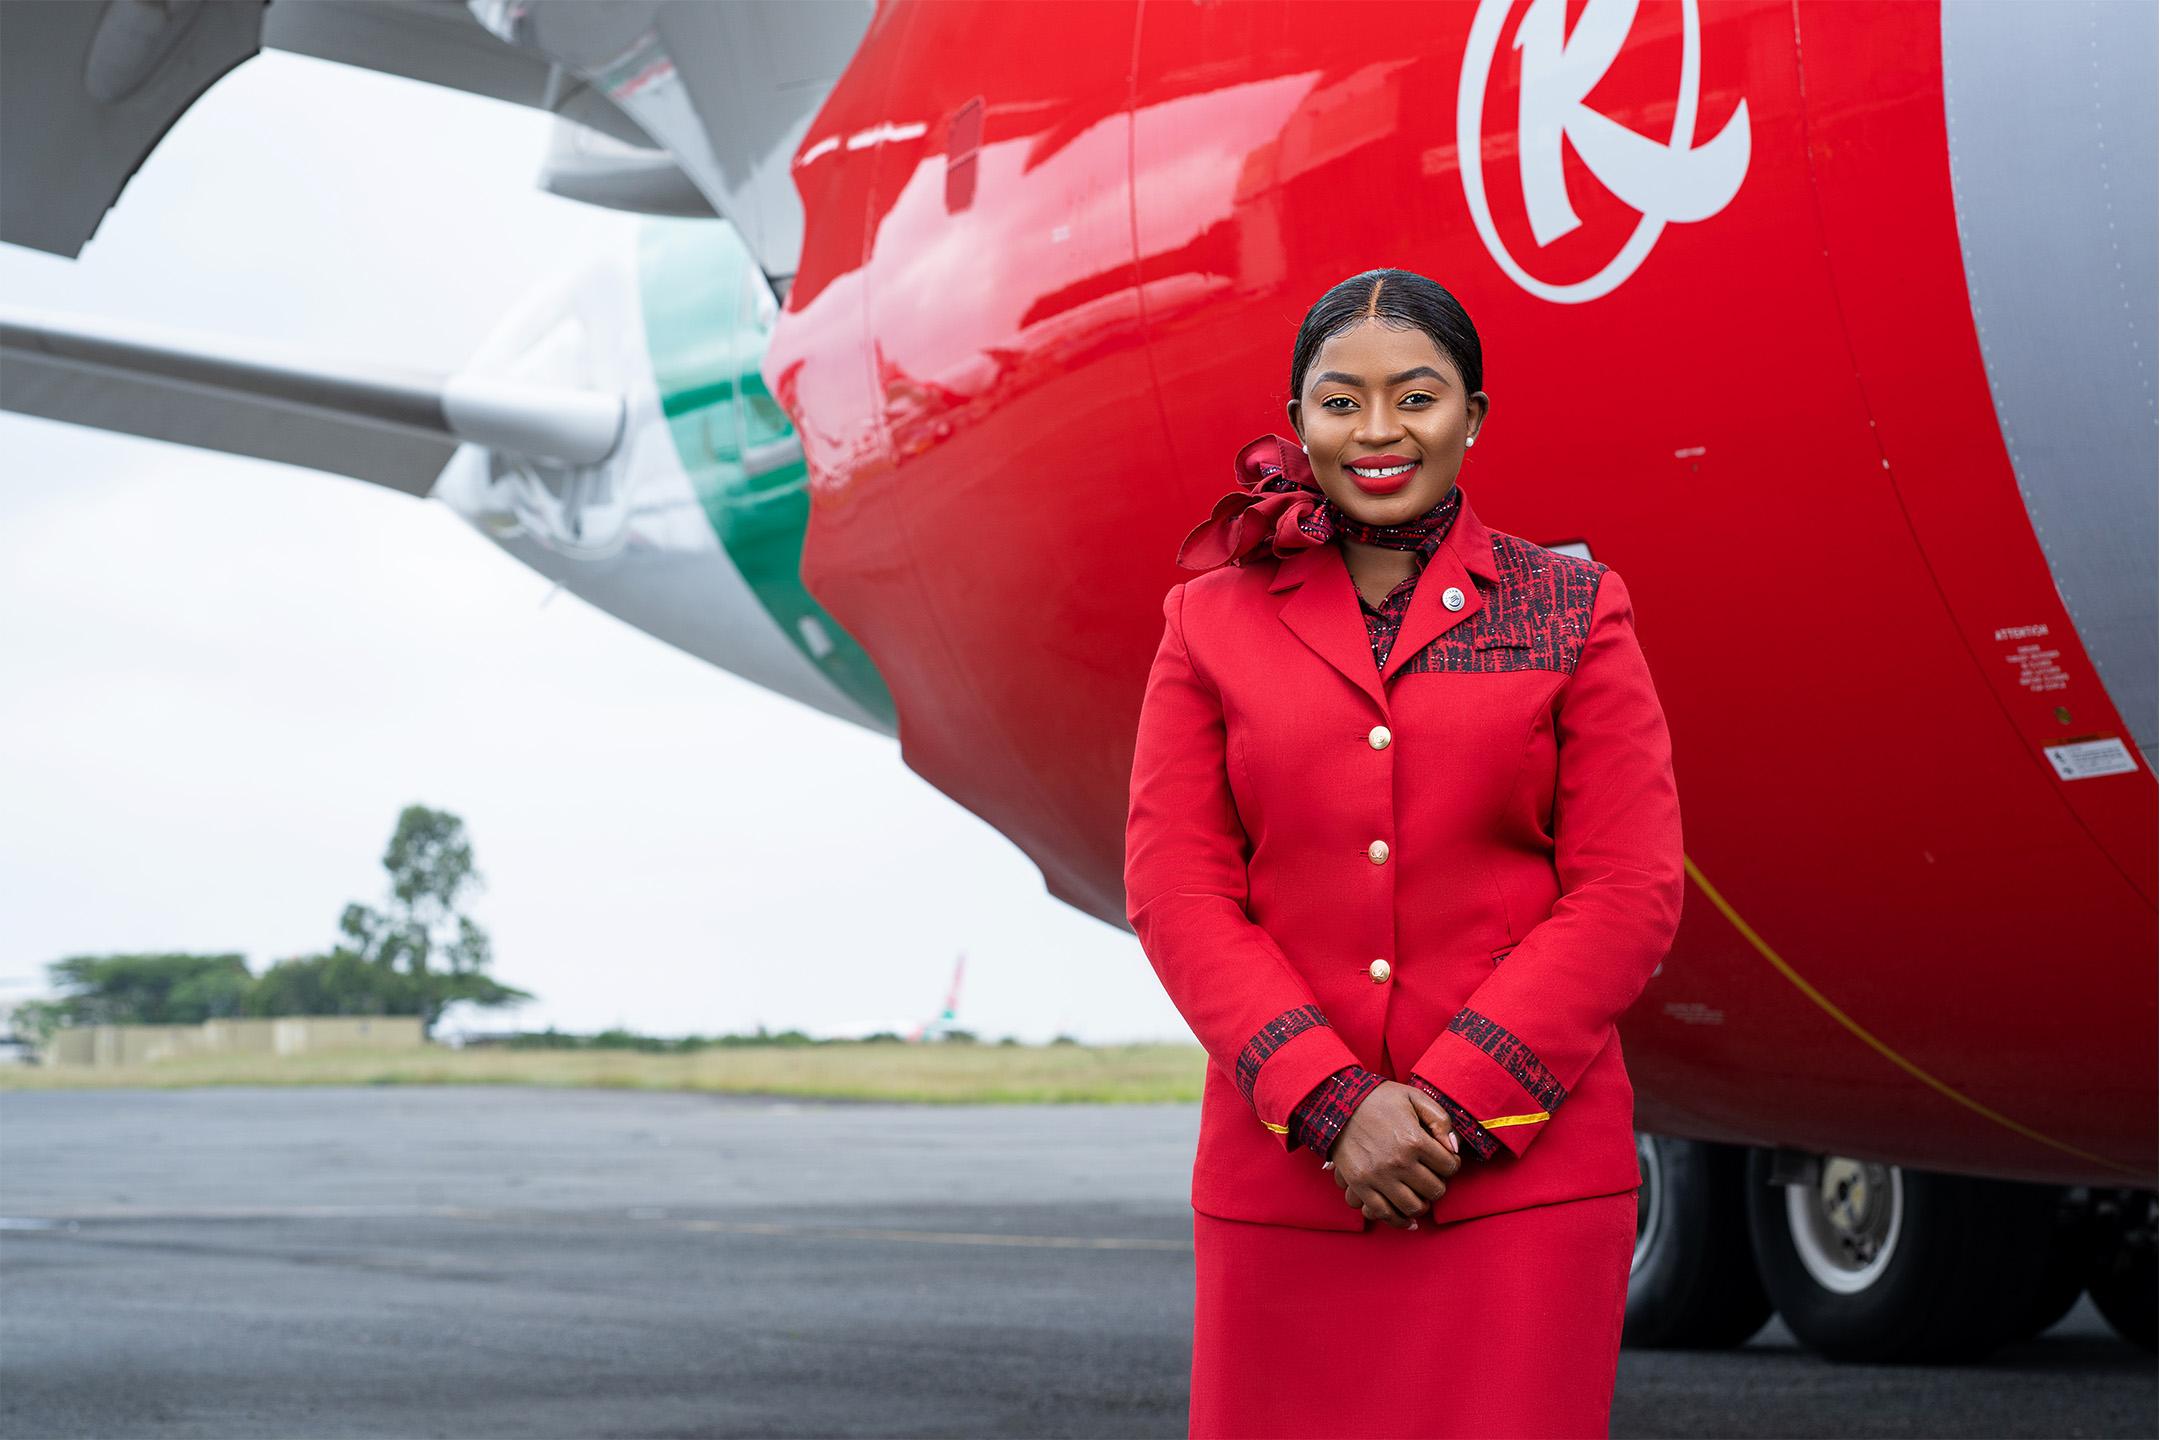 Royal Reel Photography Clients - Kenya Airways KQ (5)